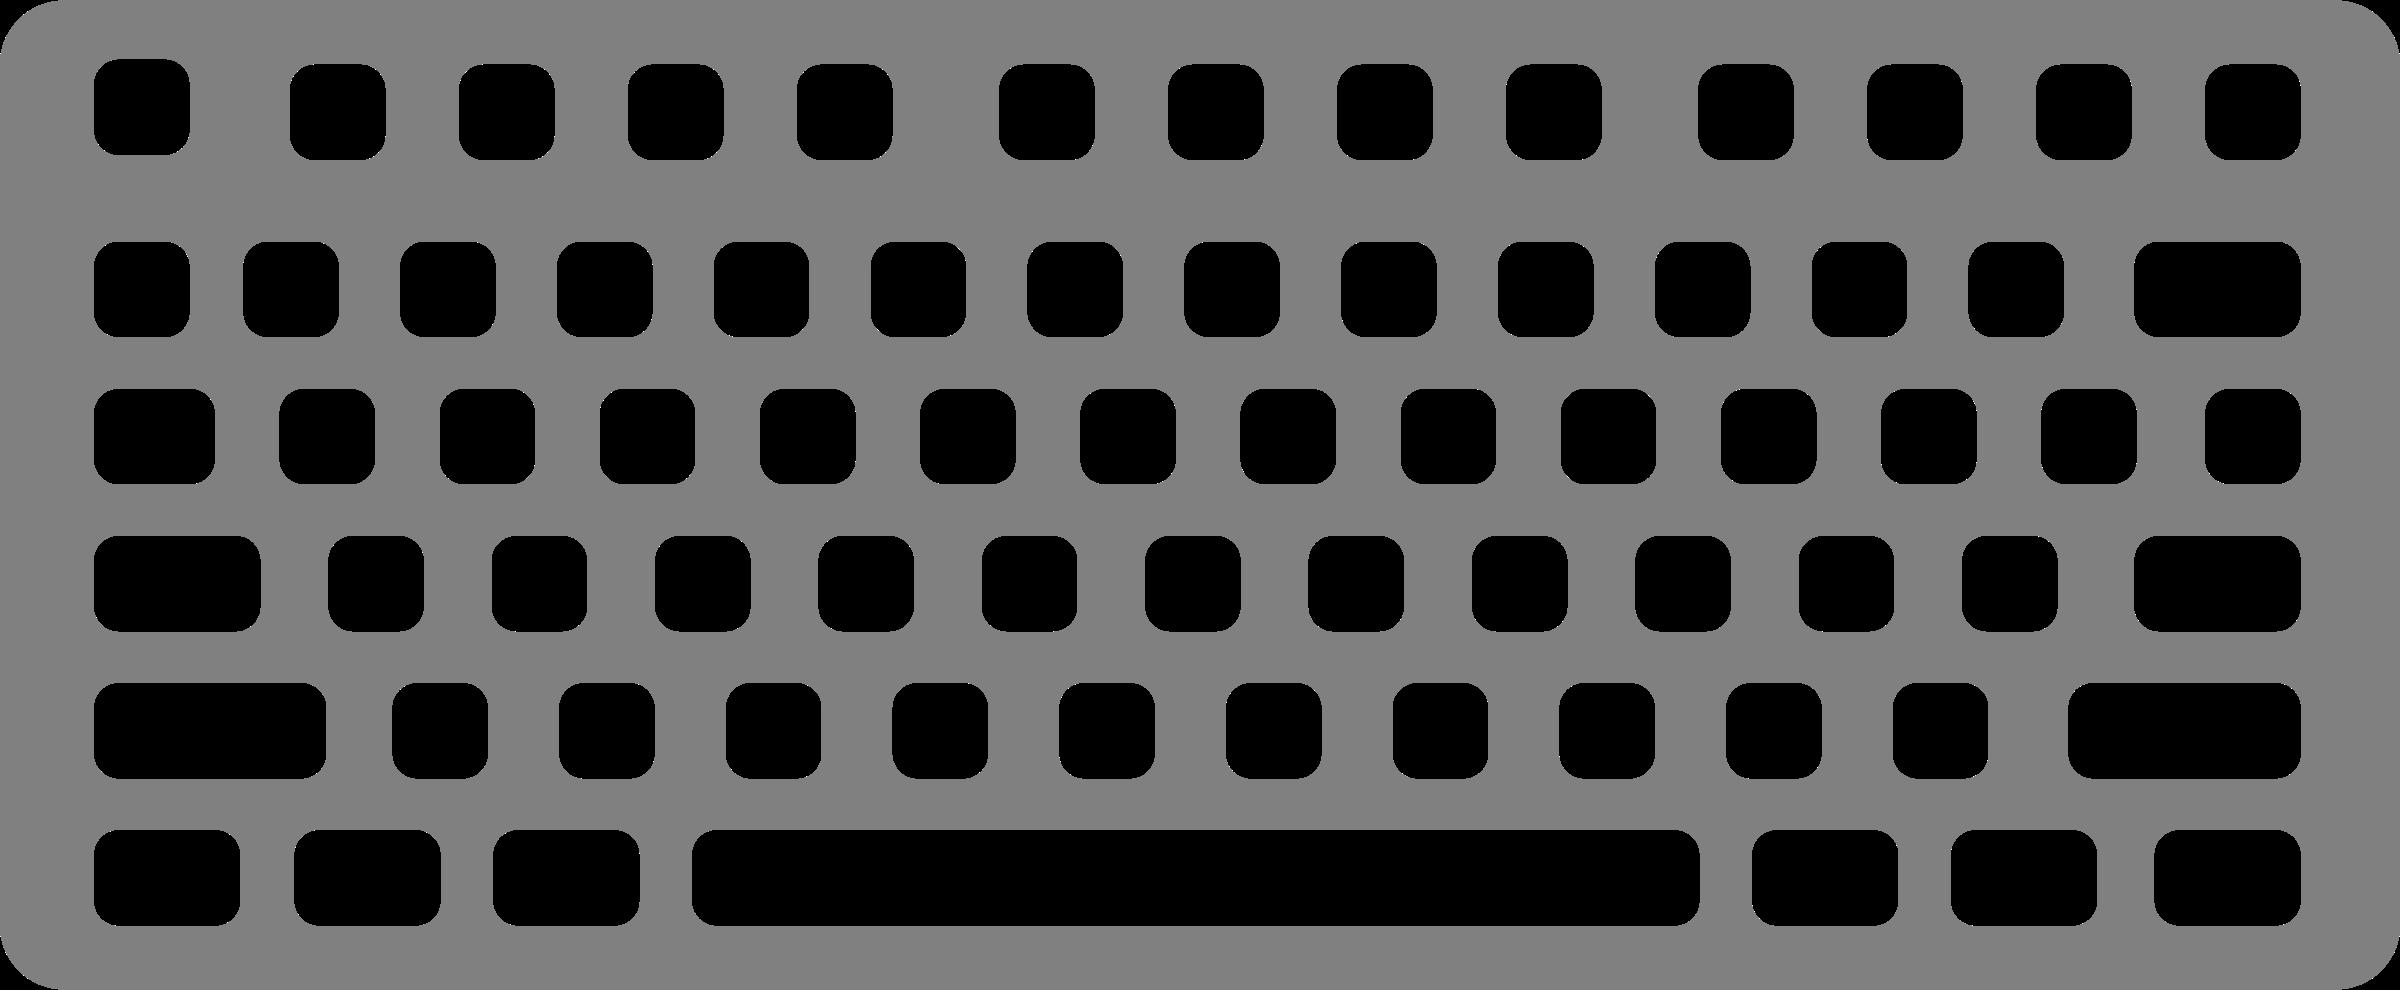 Keyboard Clipart Scrambled Keyboard Scrambled Transparent